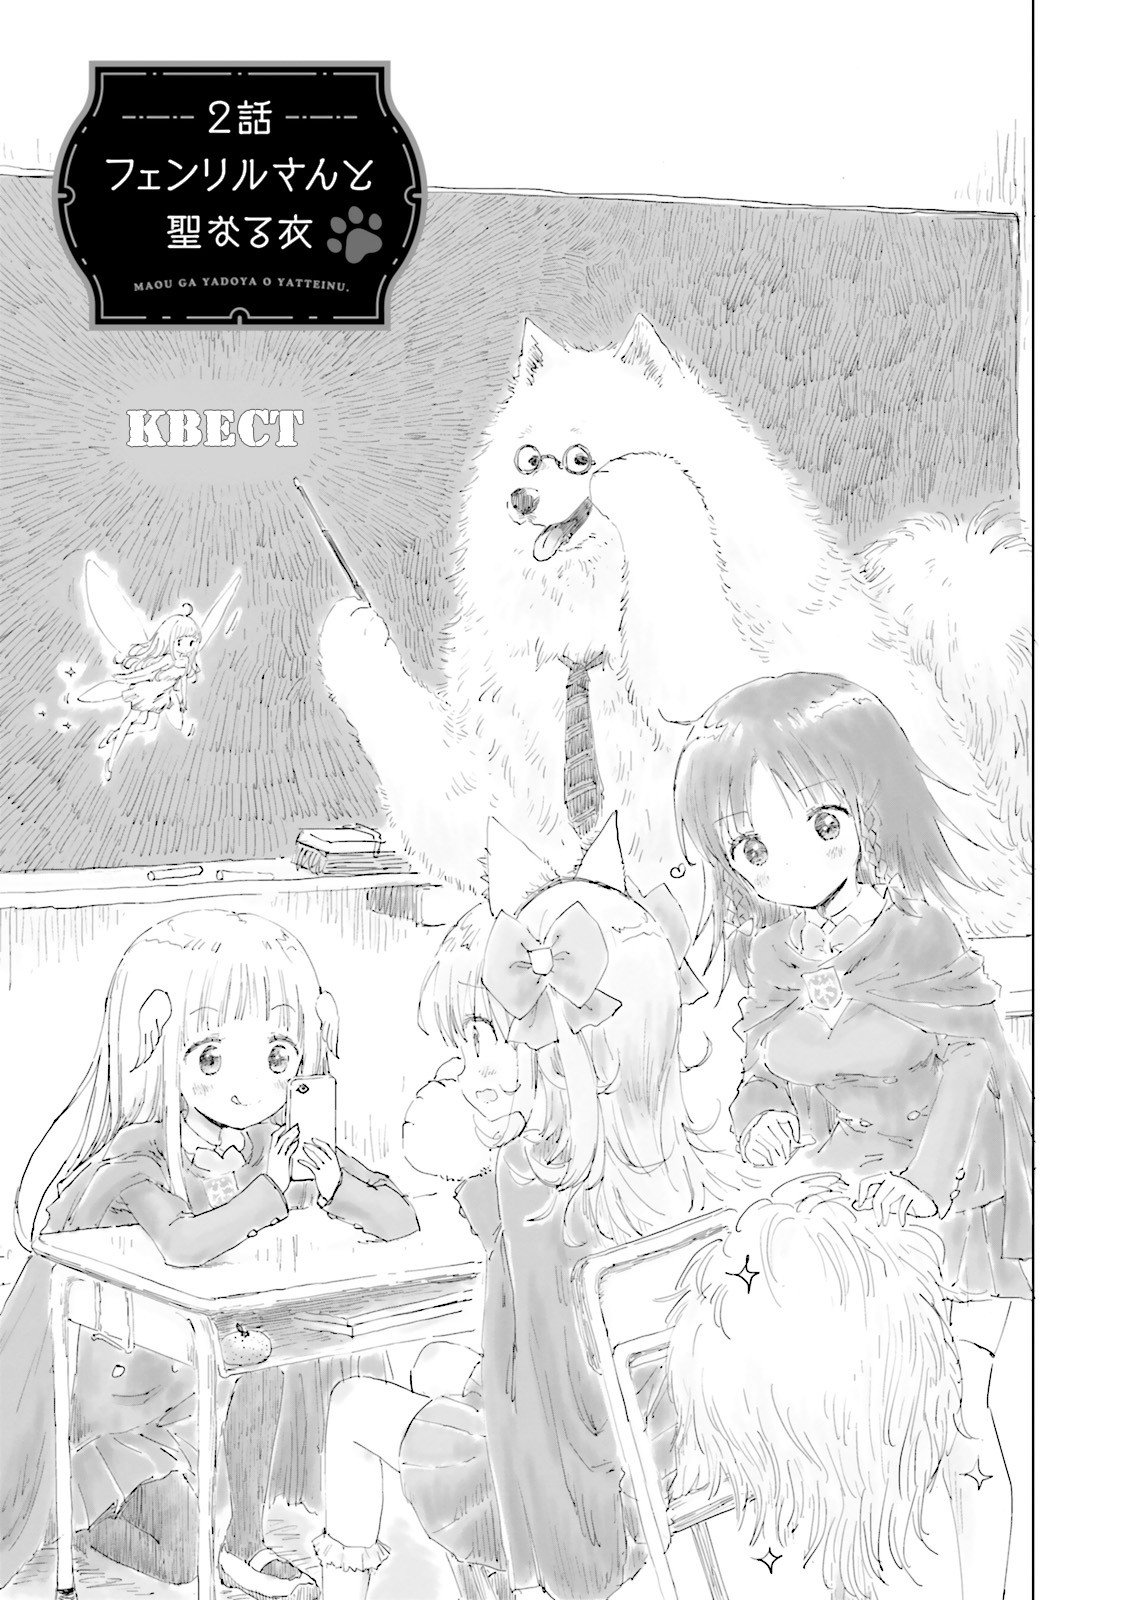 https://r1.ninemanga.com/comics/pic2/7/34887/590023/1538520580977.jpg Page 1